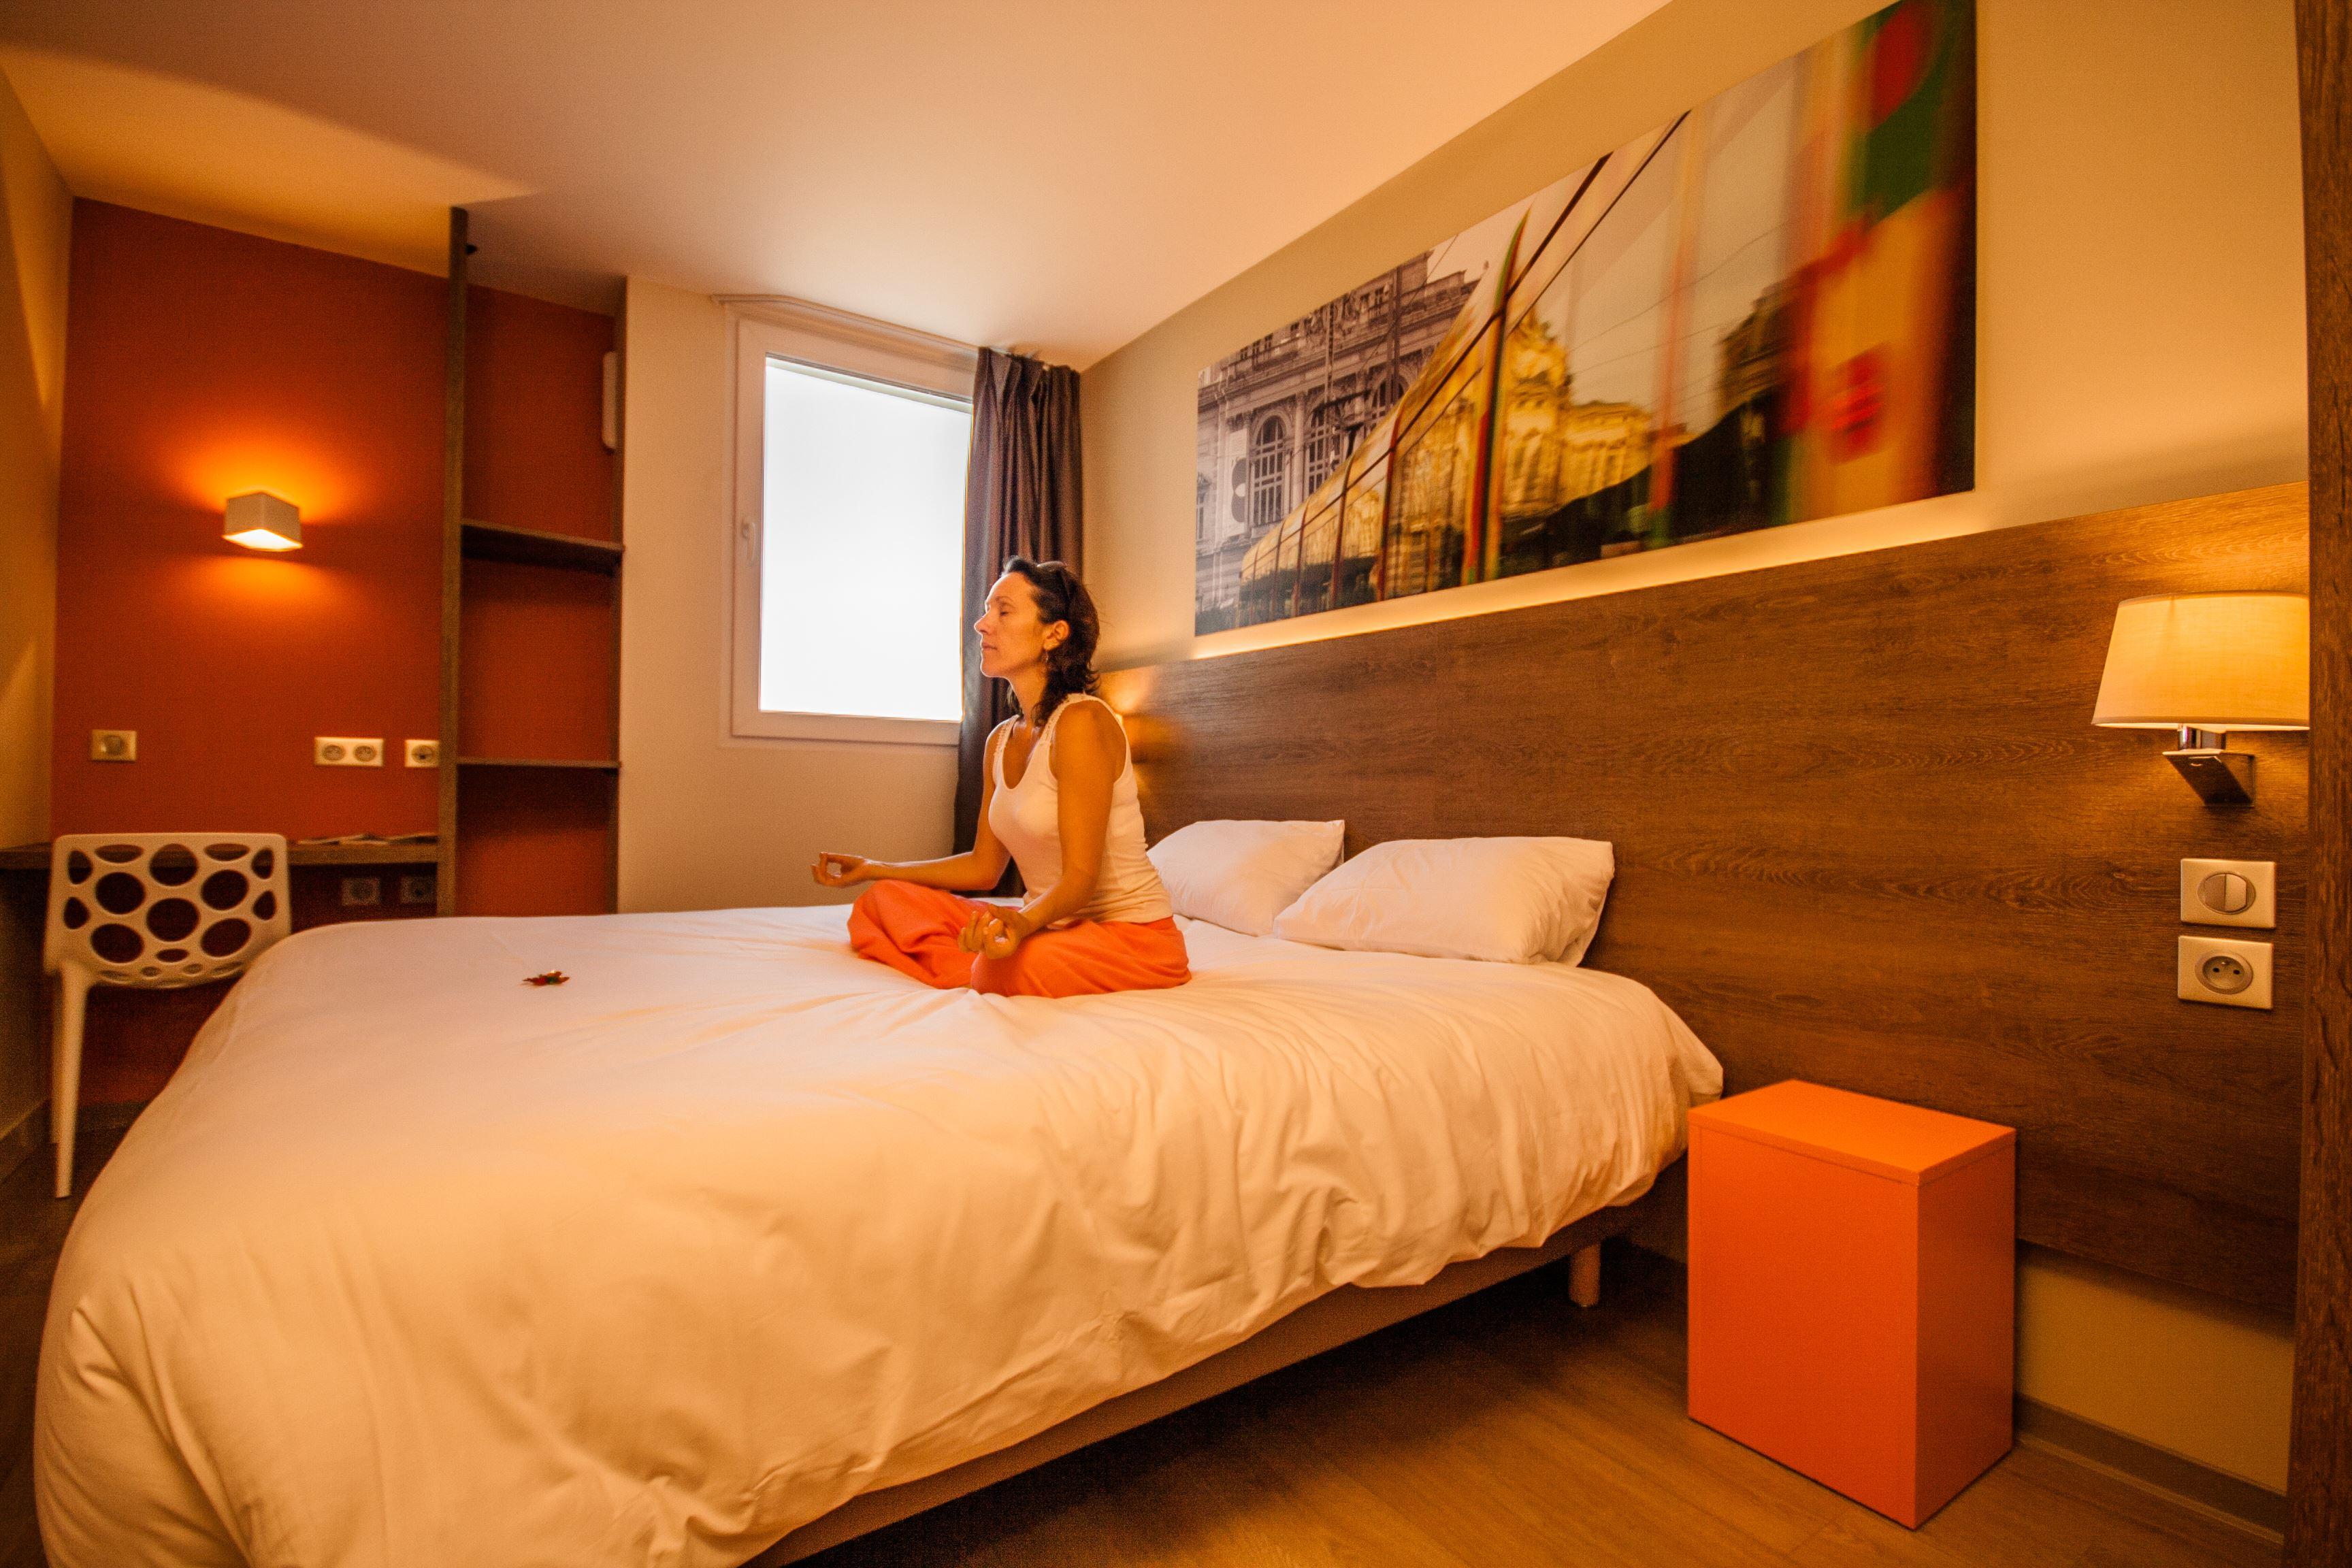 Inter-Hotel Hotelio Montpellier Sud